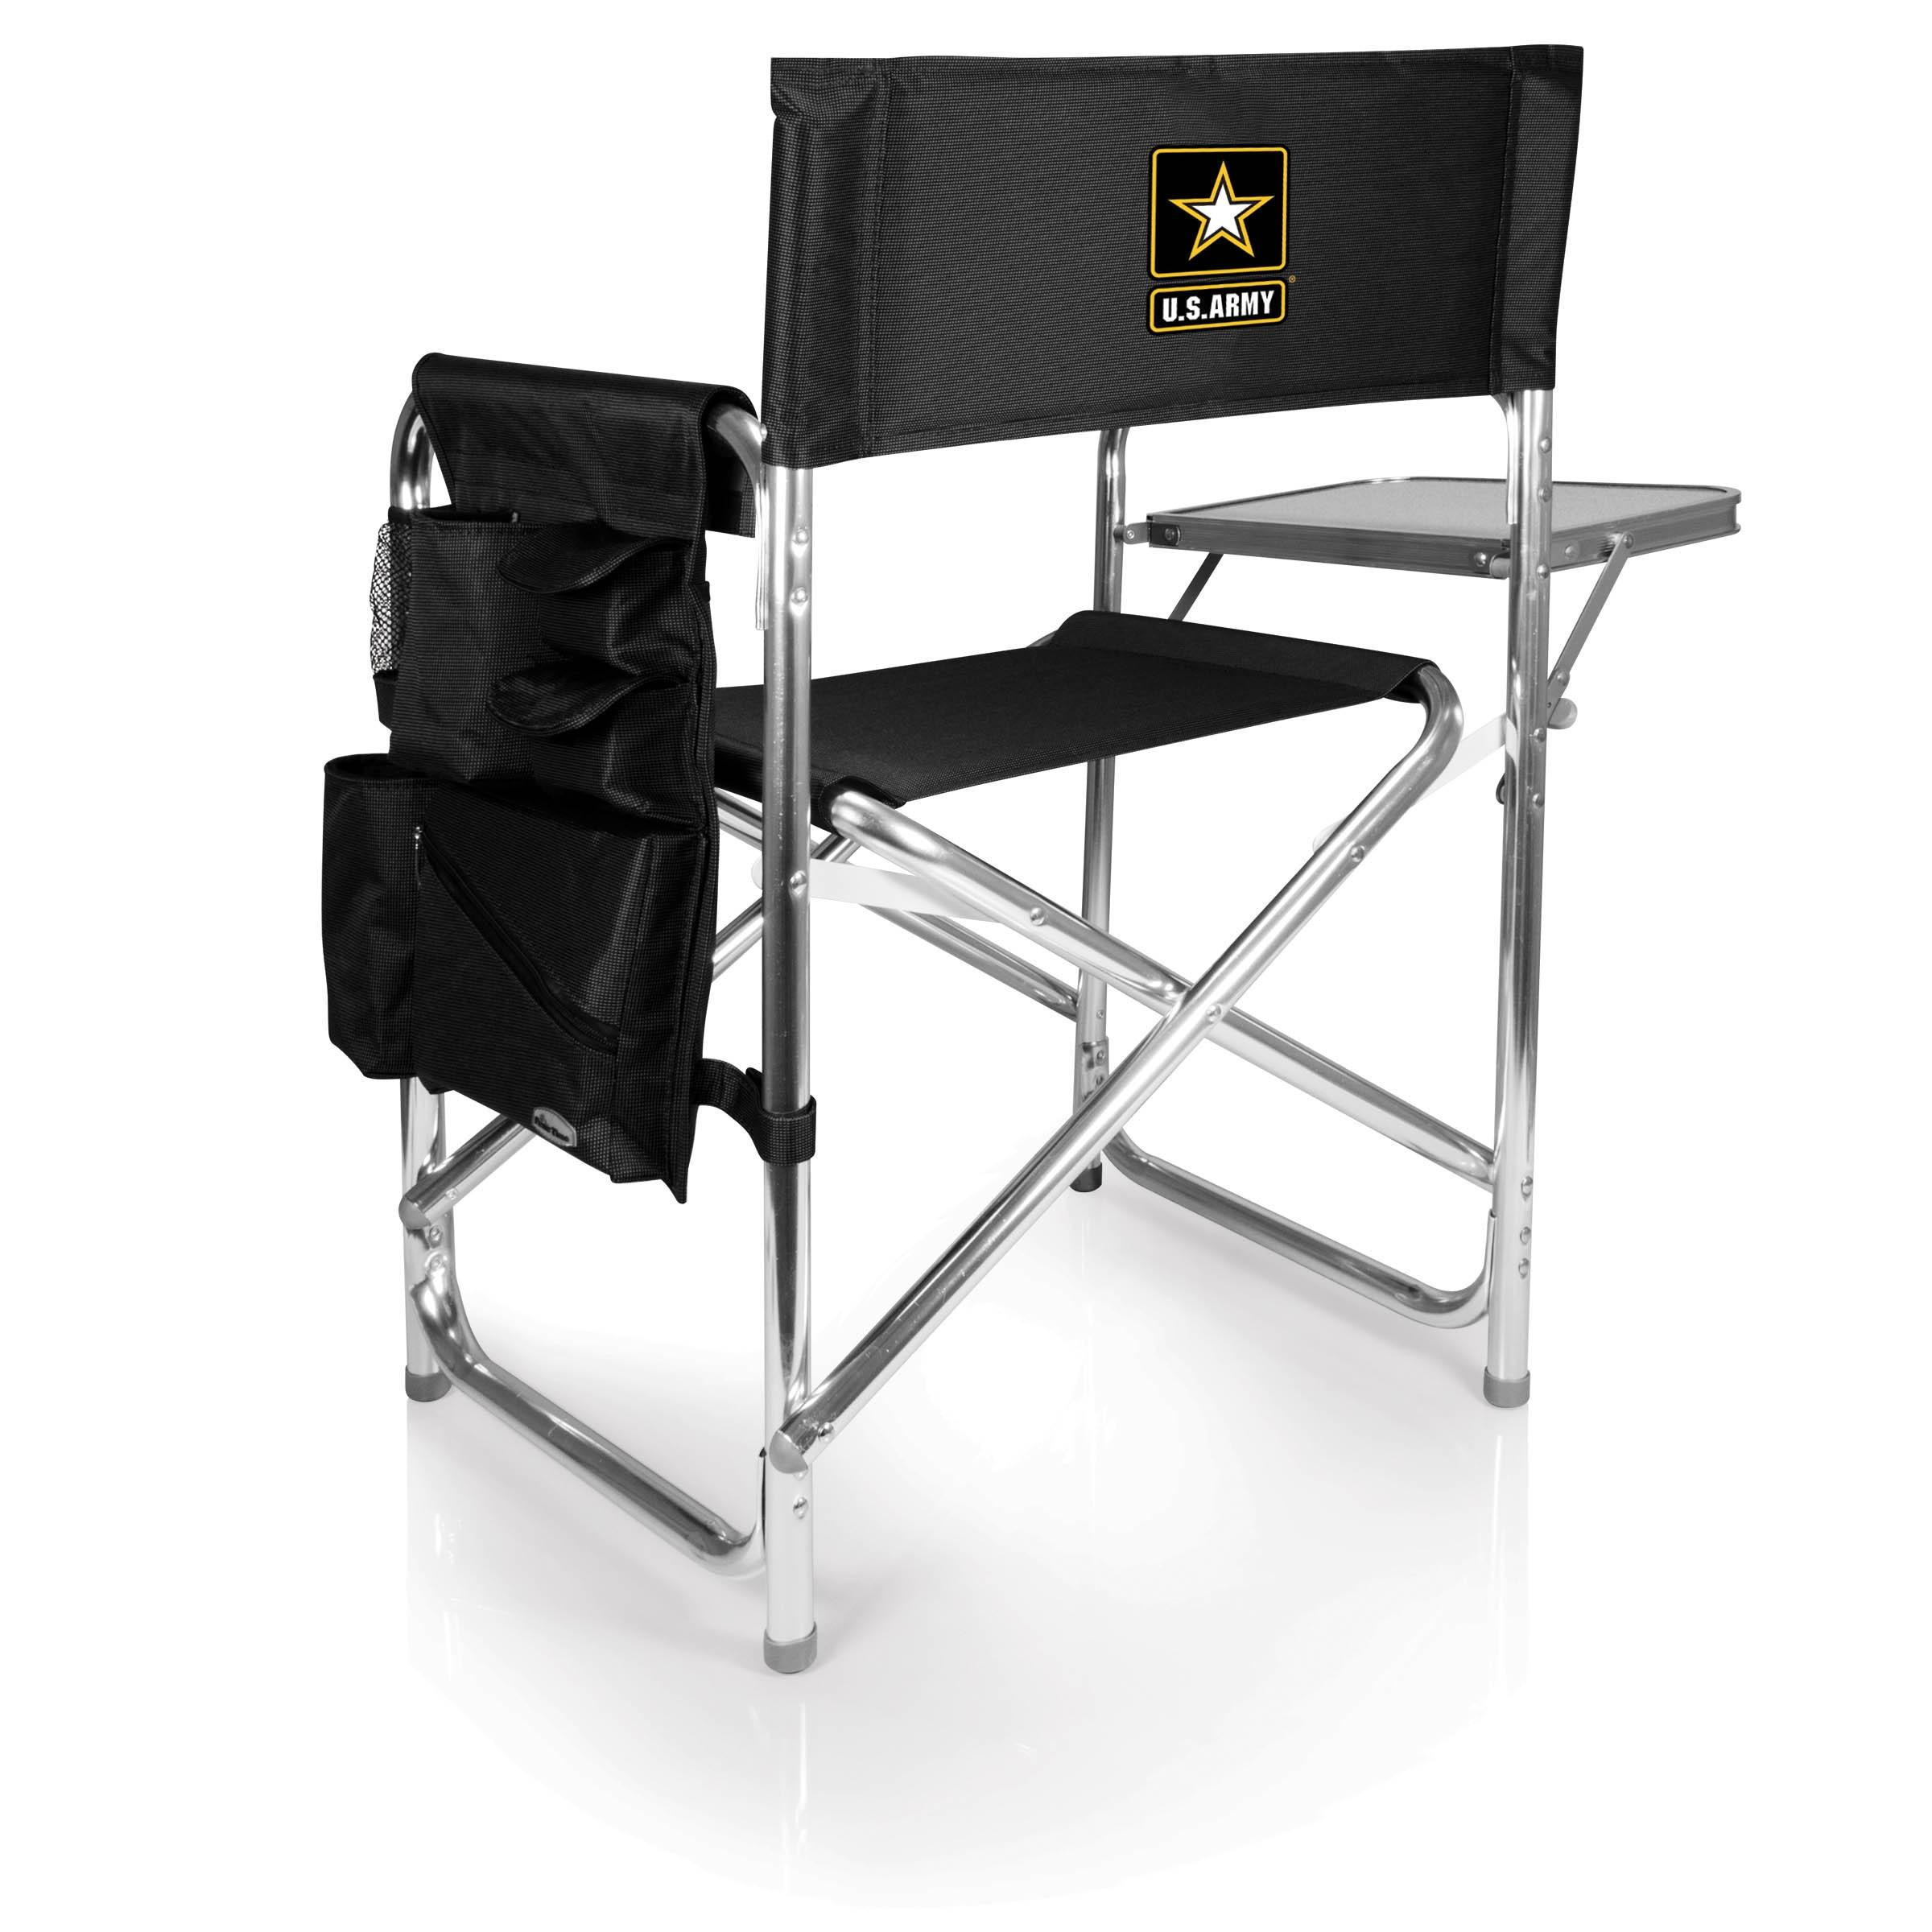 Oniva Picnic Time U.S. Army Black Sports Chair (Picnic Time)